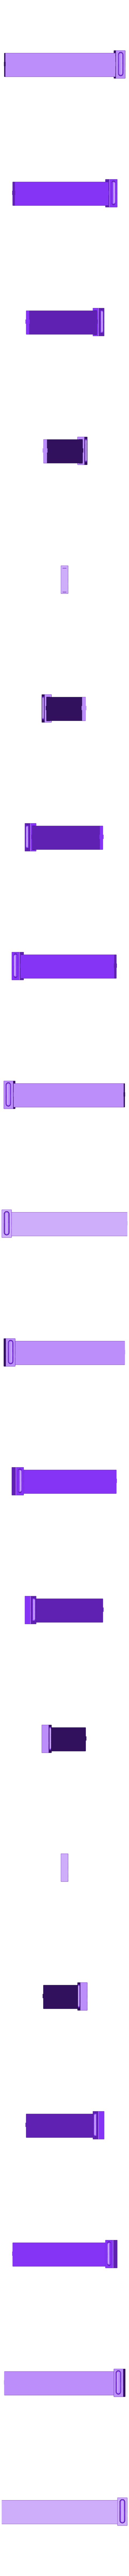 Speed Loader- Plunger 30 Round.stl Télécharger fichier STL gratuit Chargeur rapide AR-15 • Objet pour impression 3D, DraftingJake